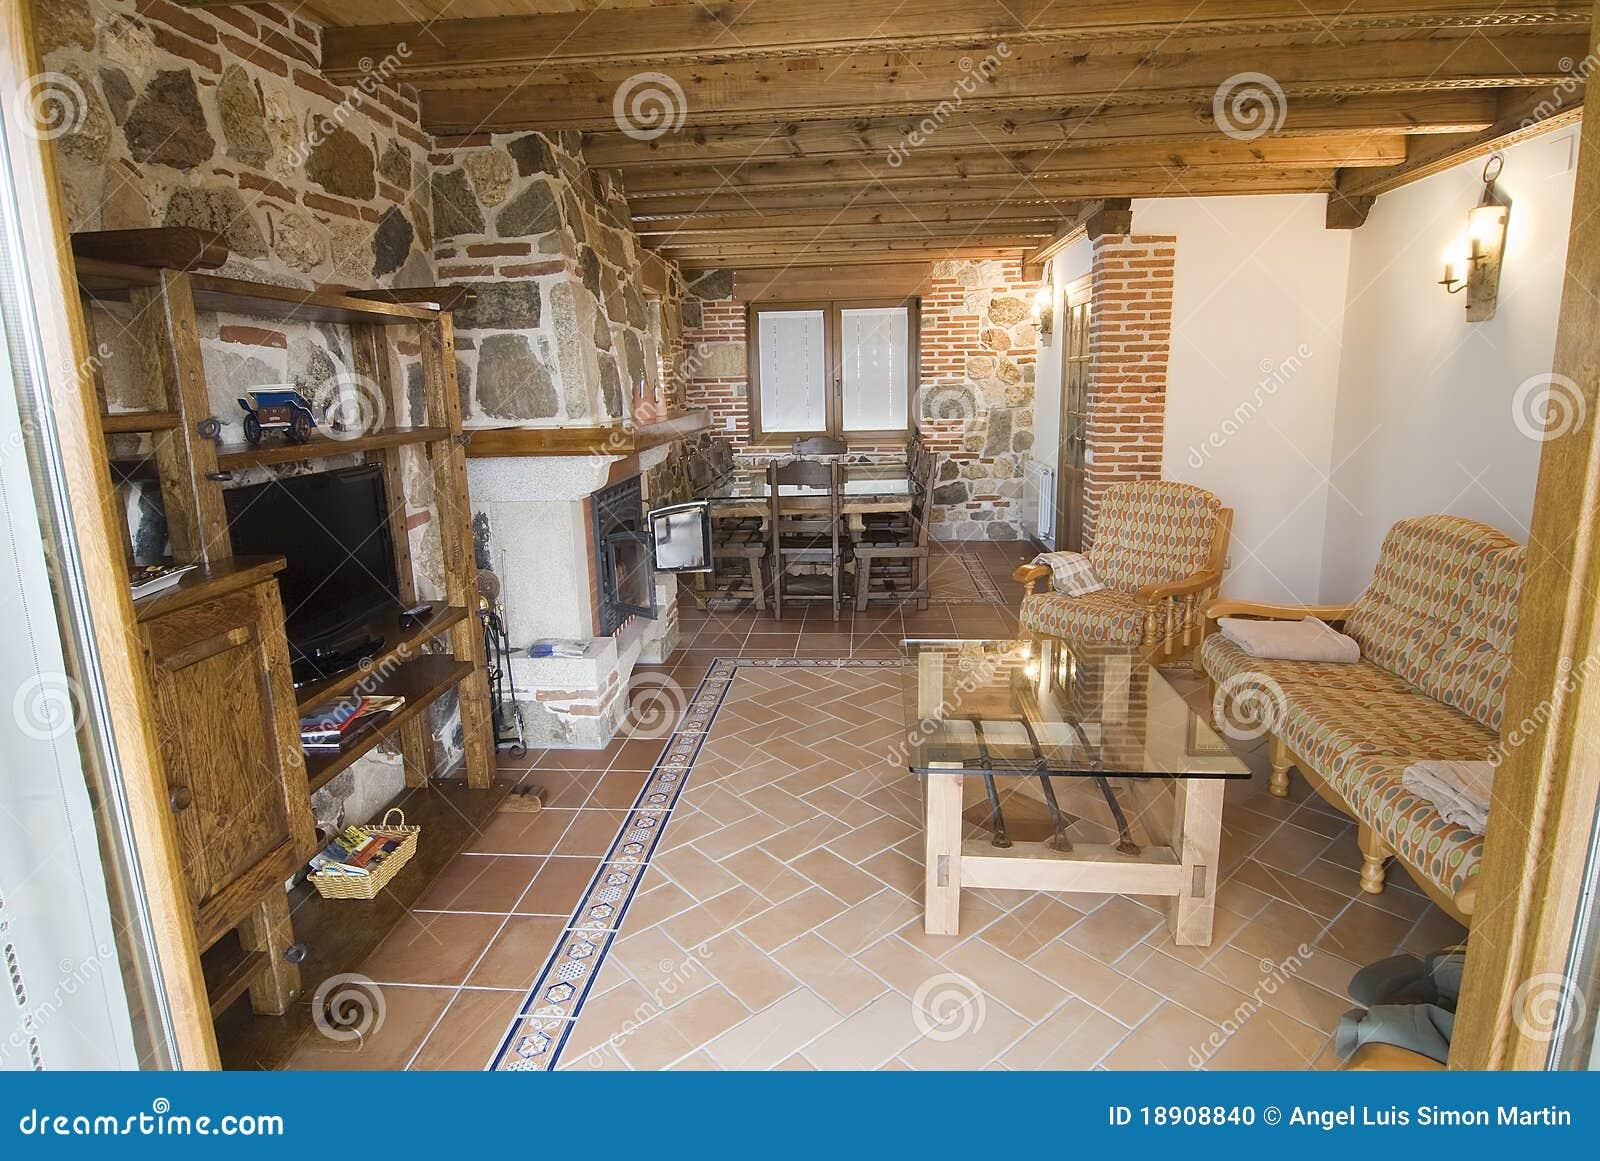 rustikales wohnzimmer stockfoto bild 18908840. Black Bedroom Furniture Sets. Home Design Ideas